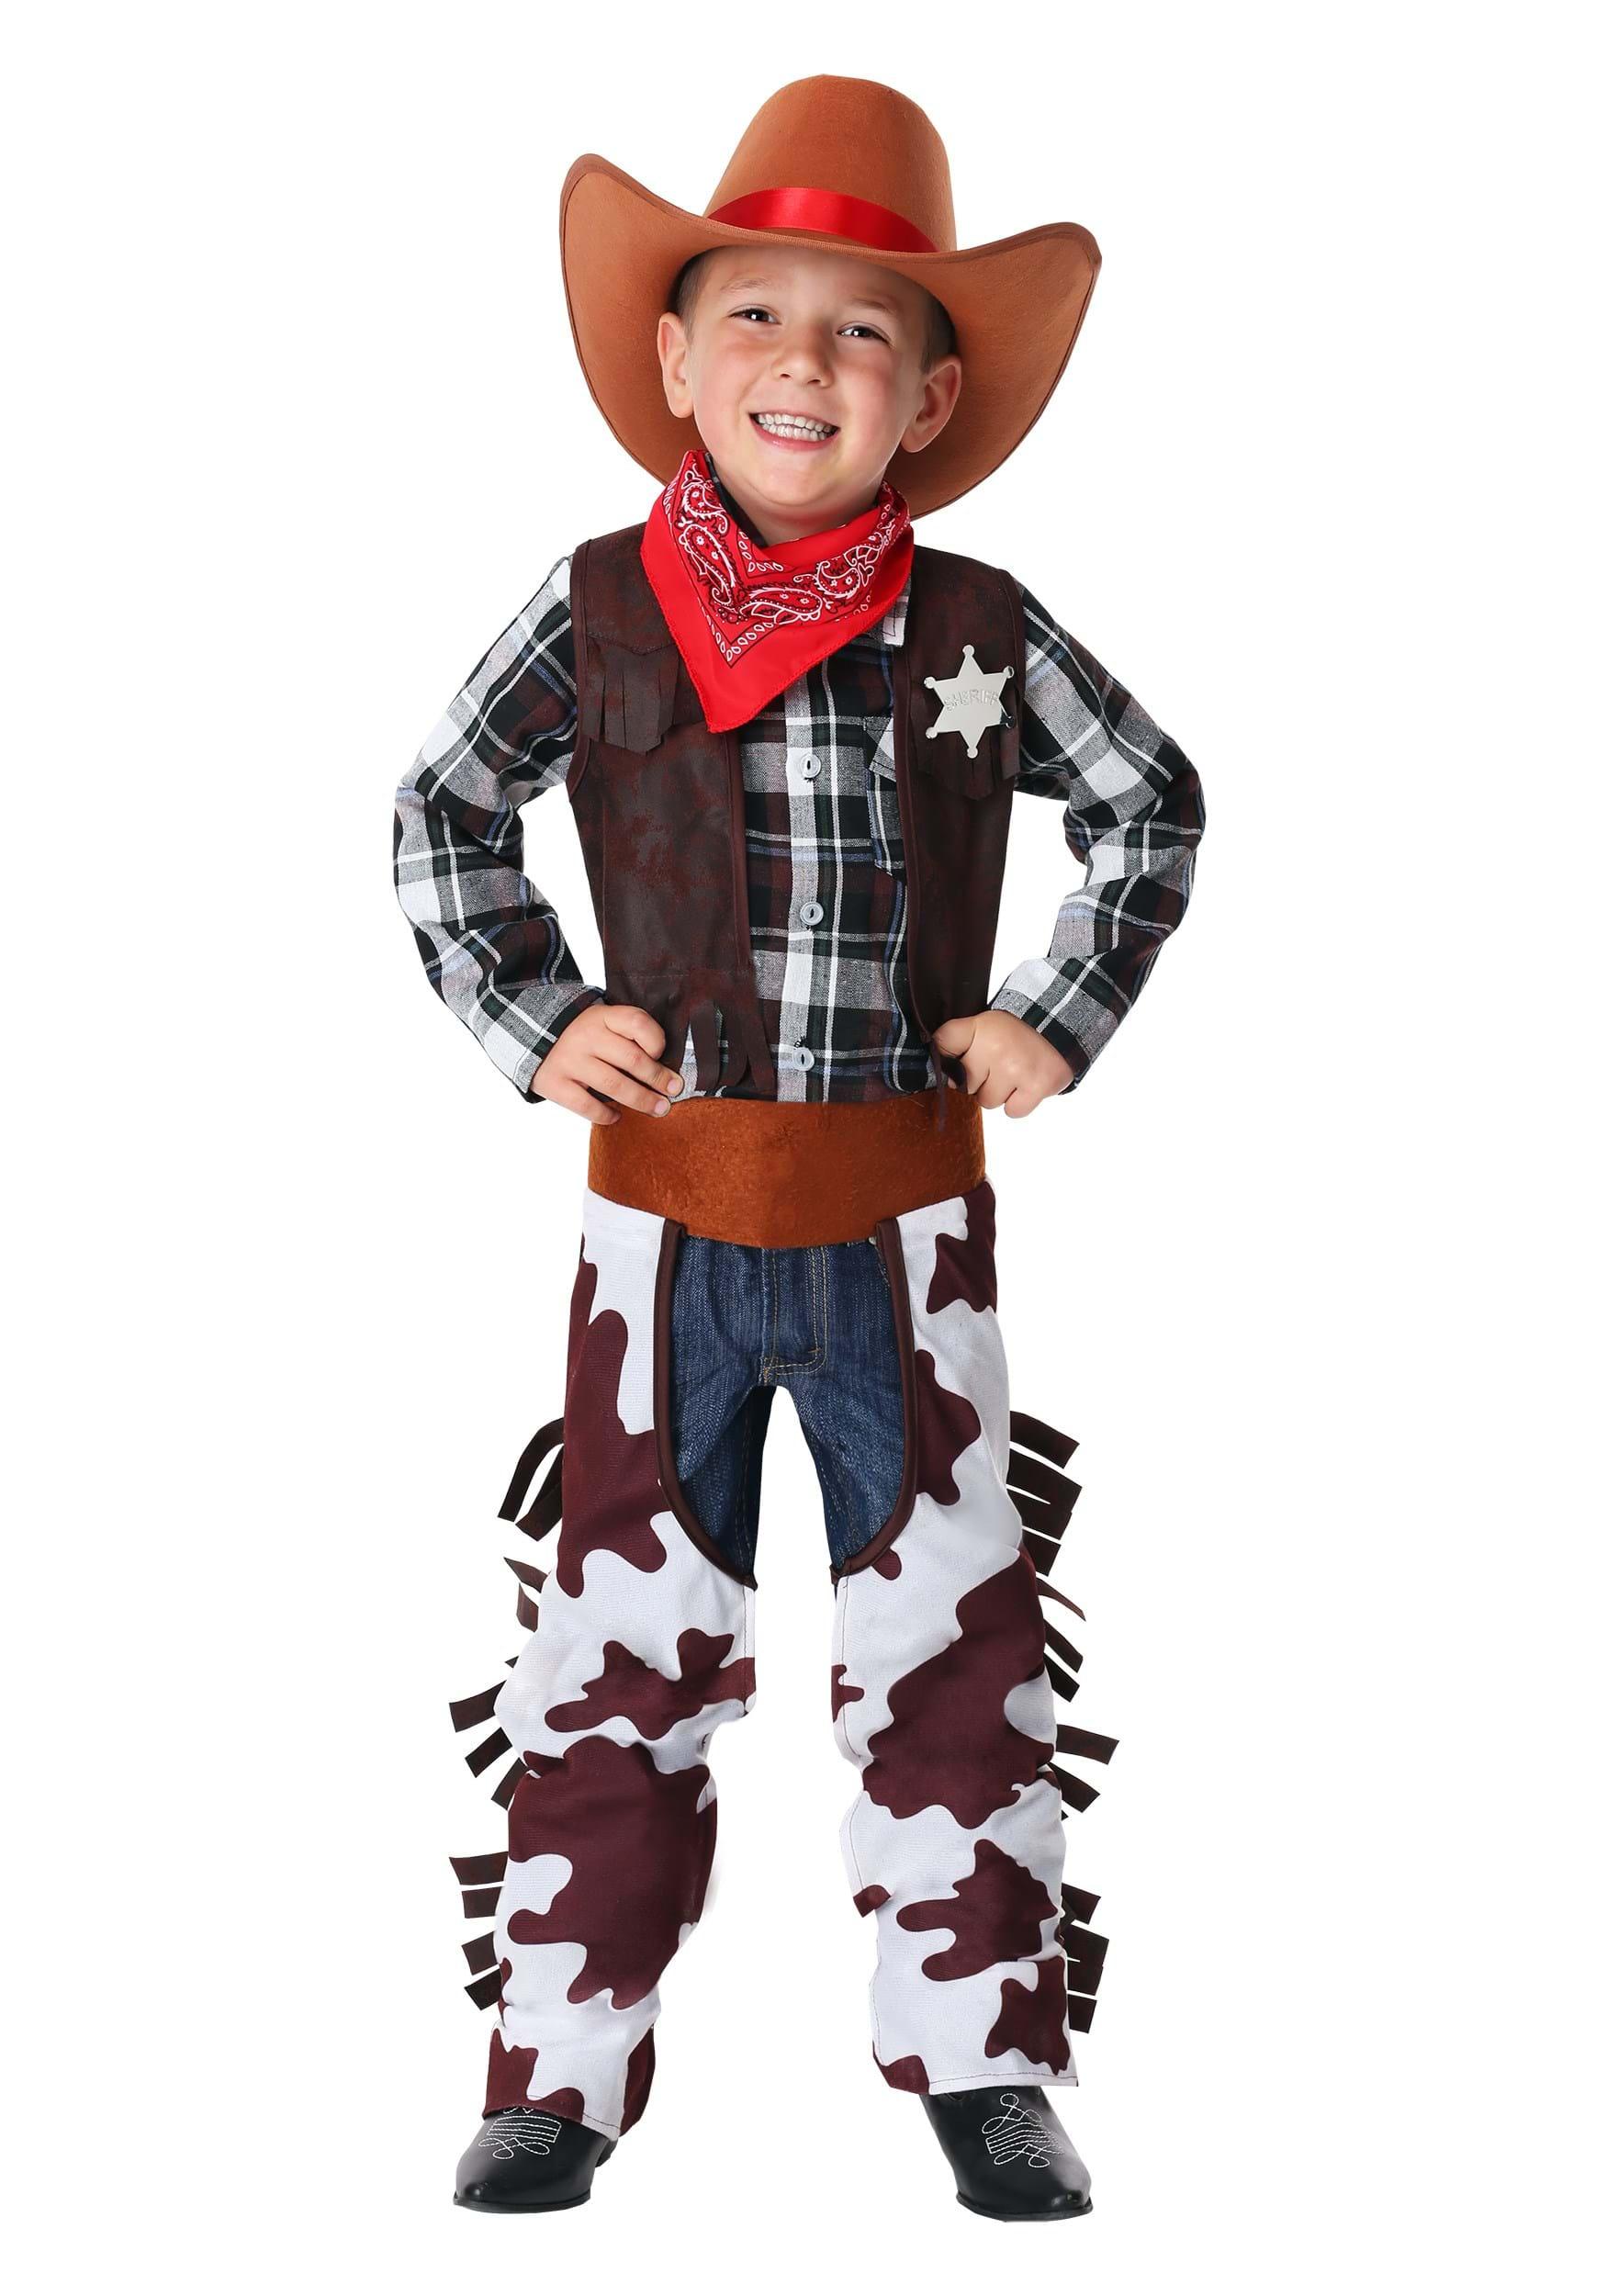 68f0e16a07c914 Wild West Sheriff Boy's Costume